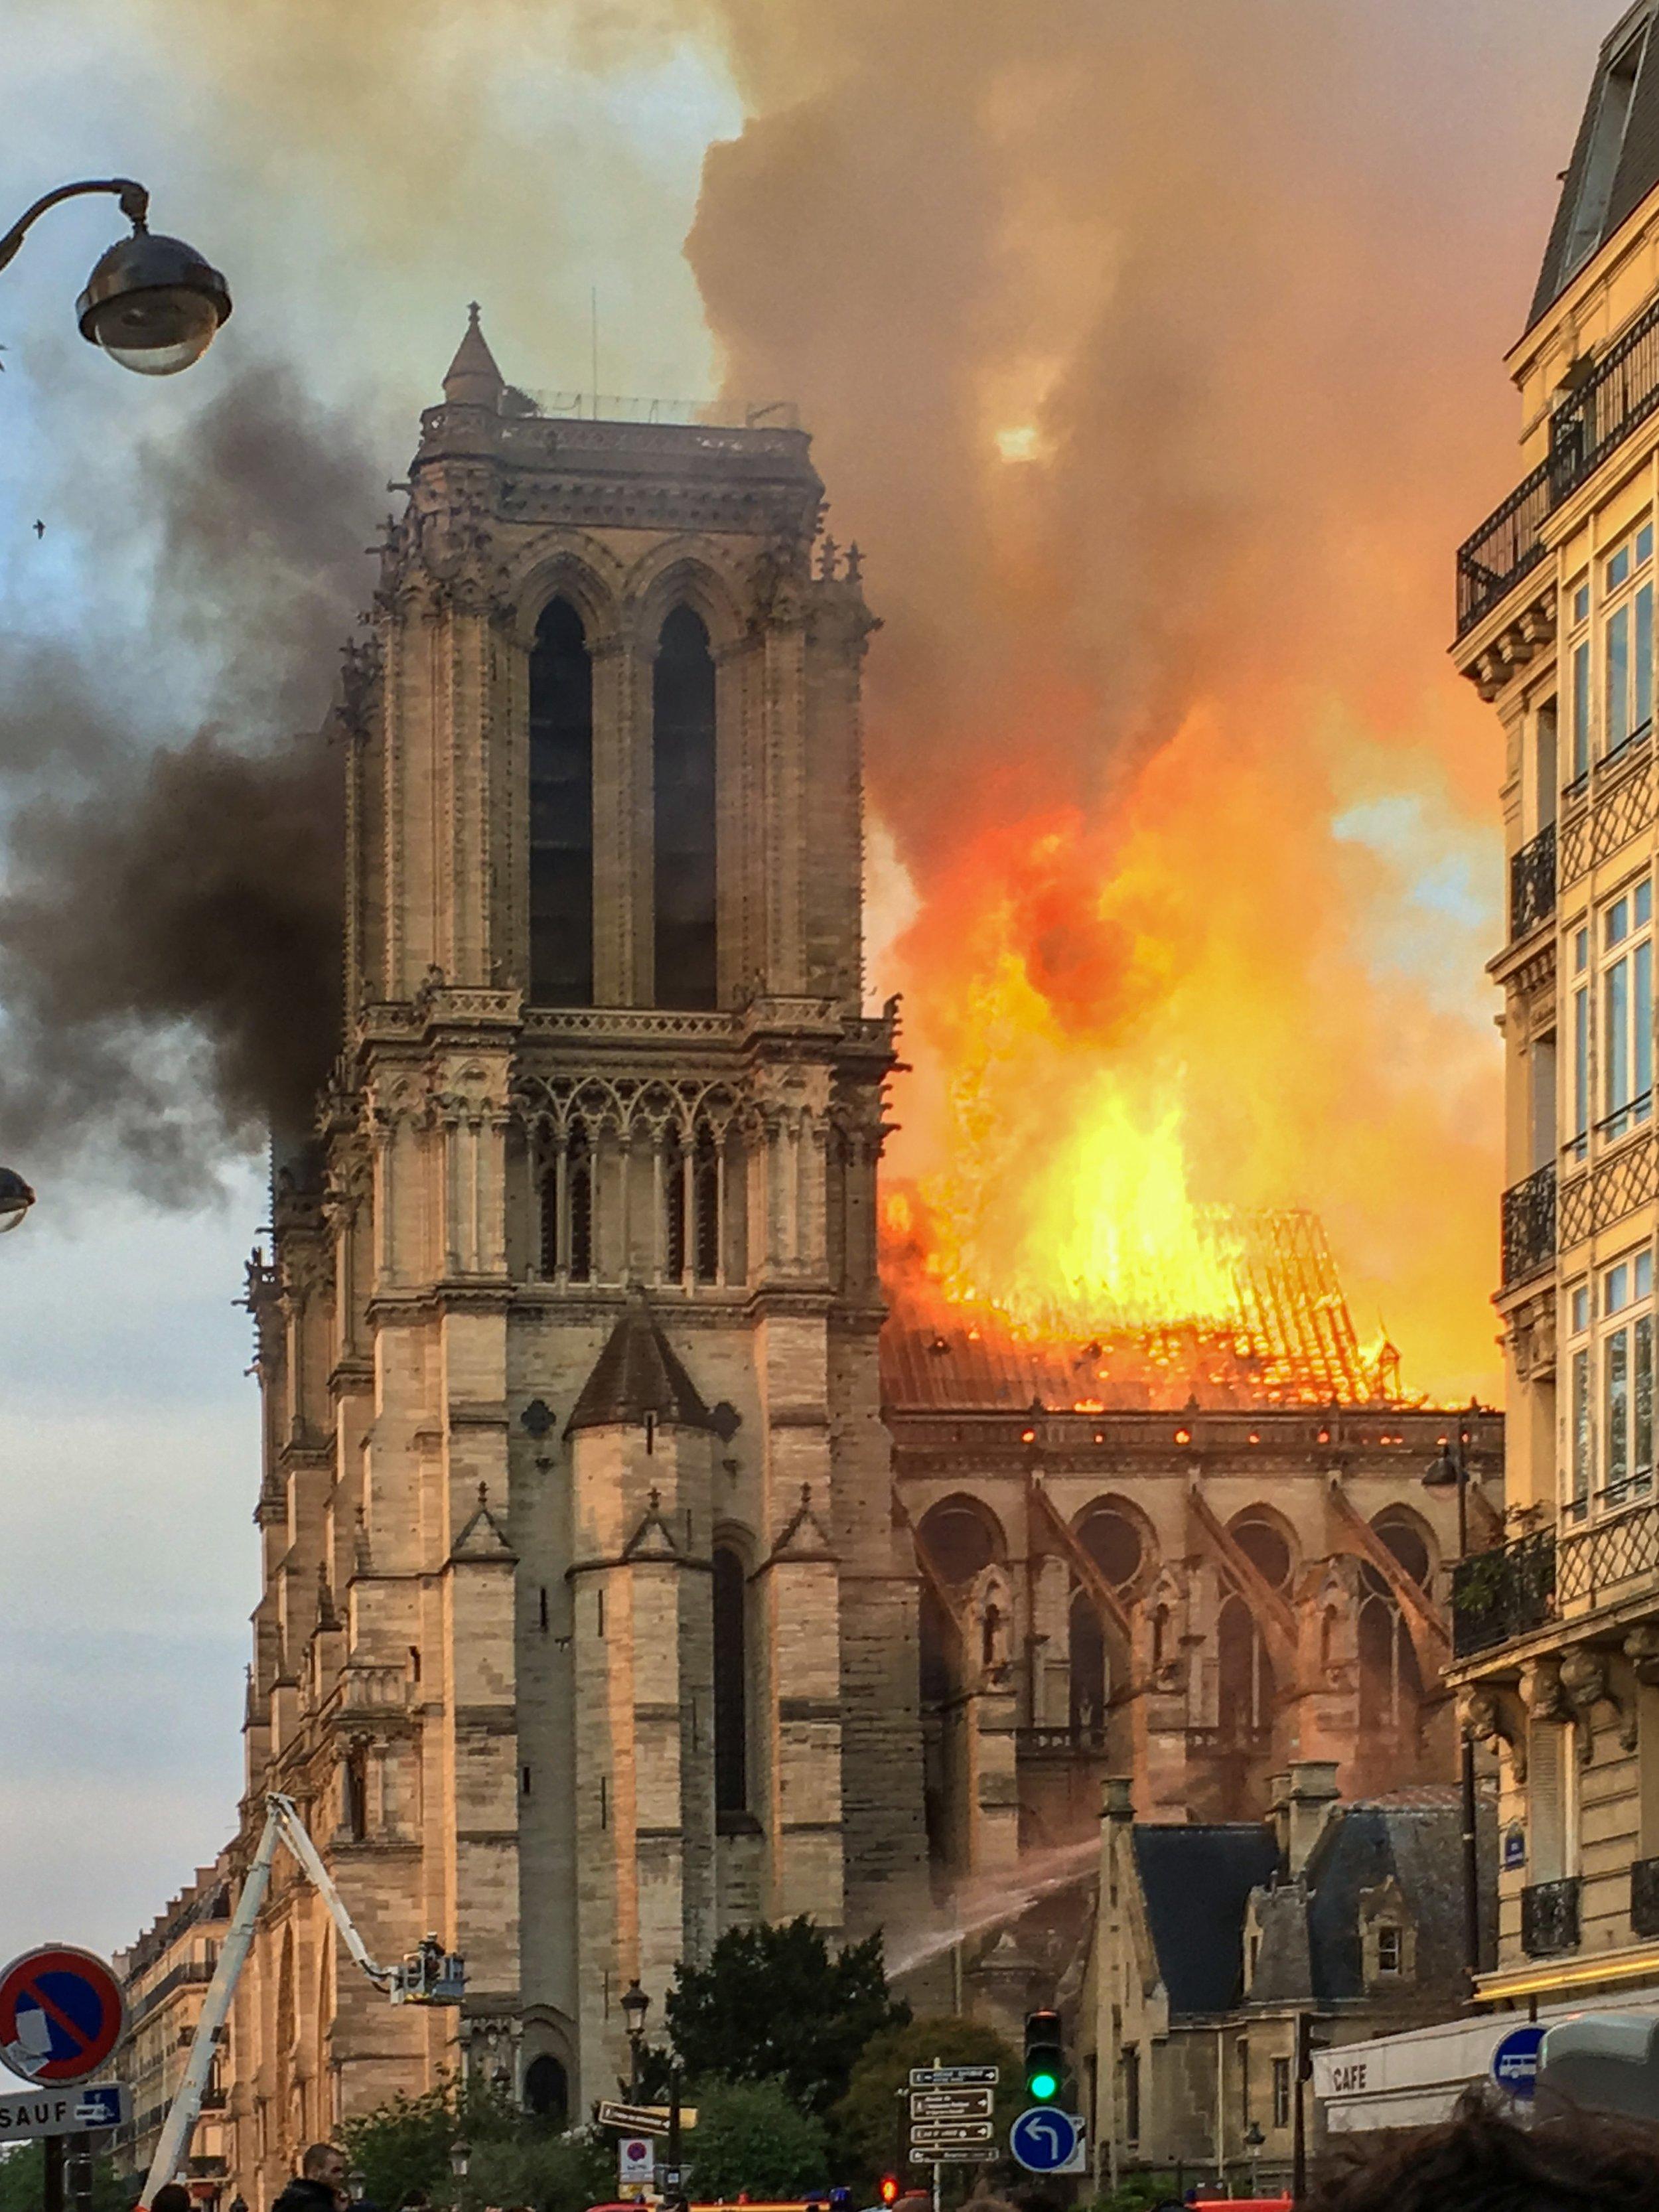 Foto:  https://en.wikipedia.org/wiki/File:Incendie_Notre_Dame_de_Paris.jpg